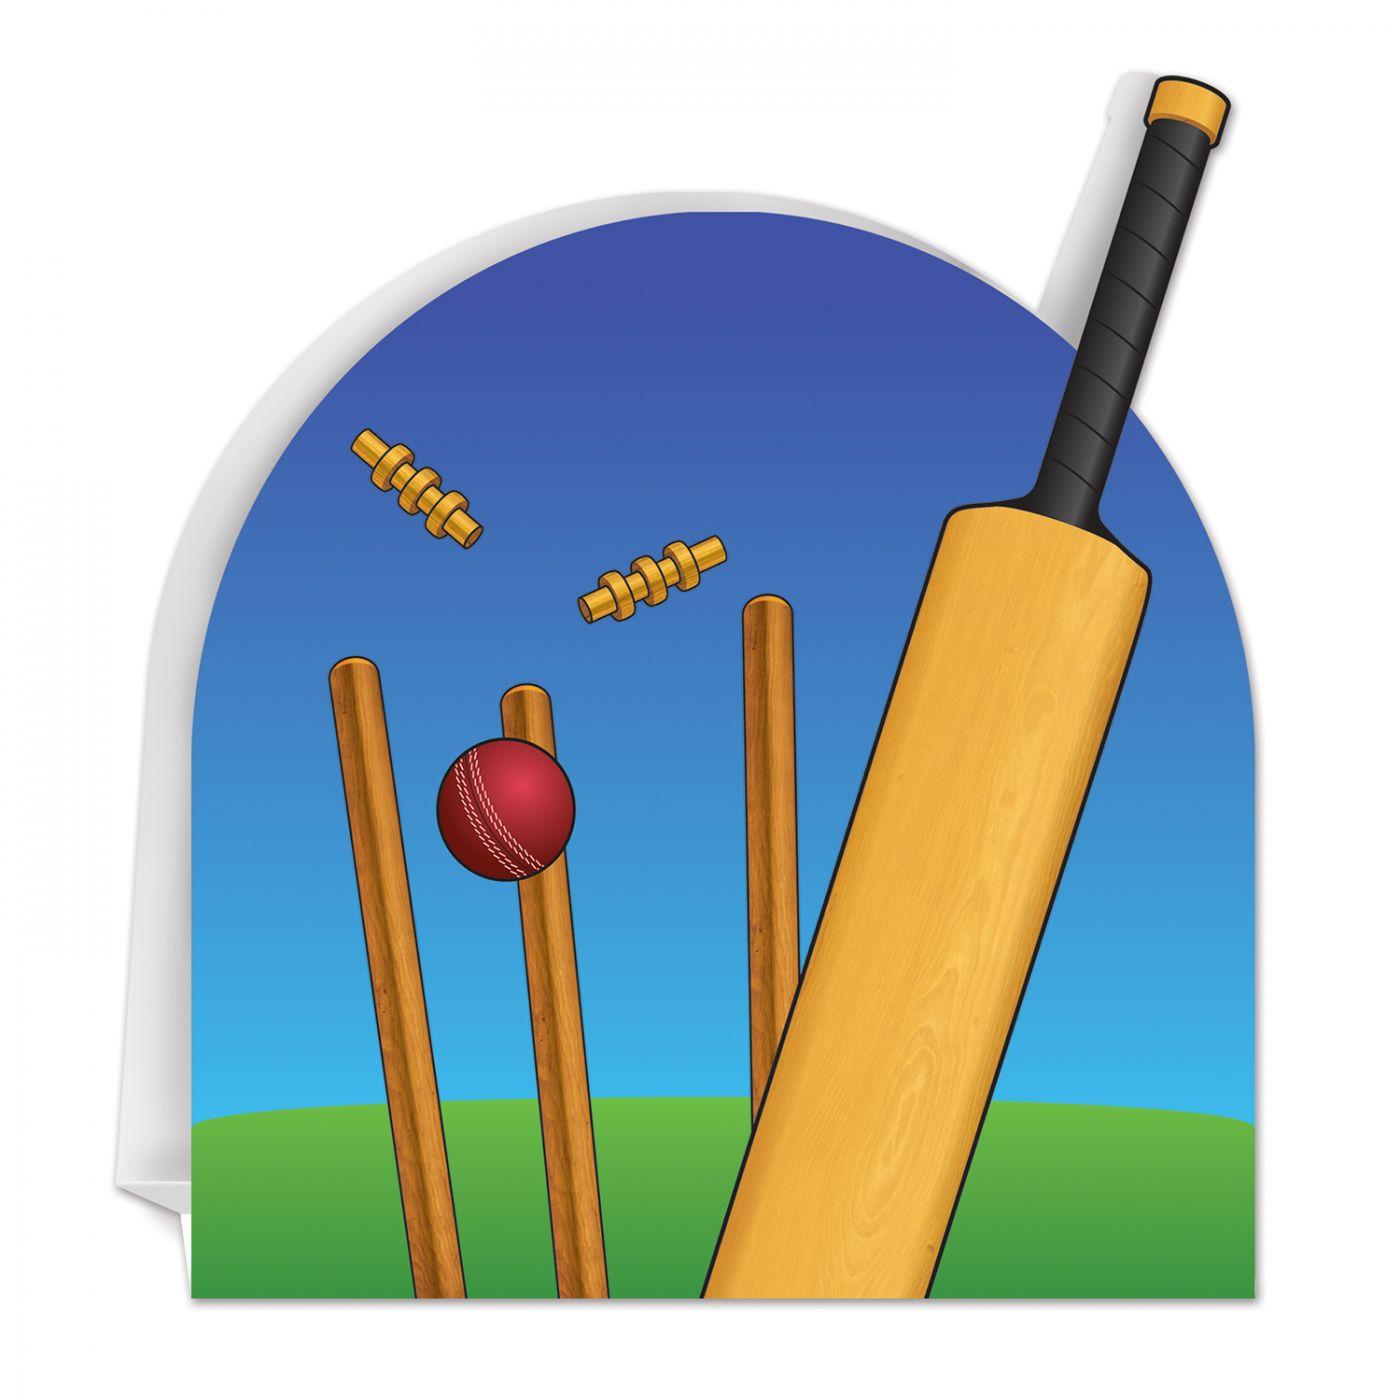 Cricket 3D Centerpiece image